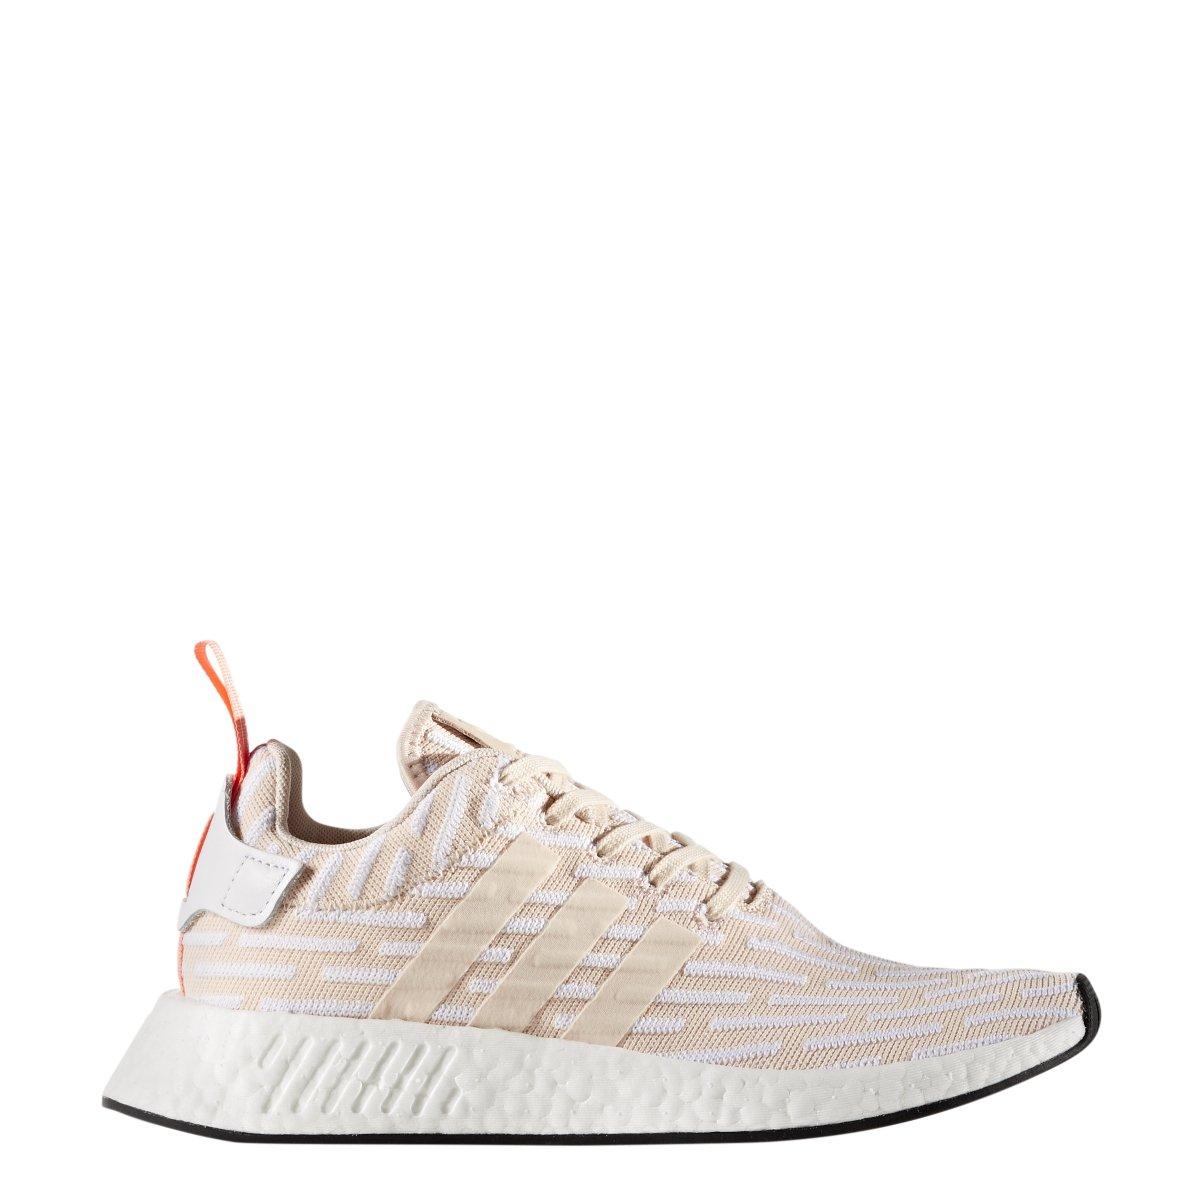 adidas Originals Women's 6 NMD_r2 W Sneaker B06Y4TJ4WN 6 Women's B(M) US|Beige 51be08